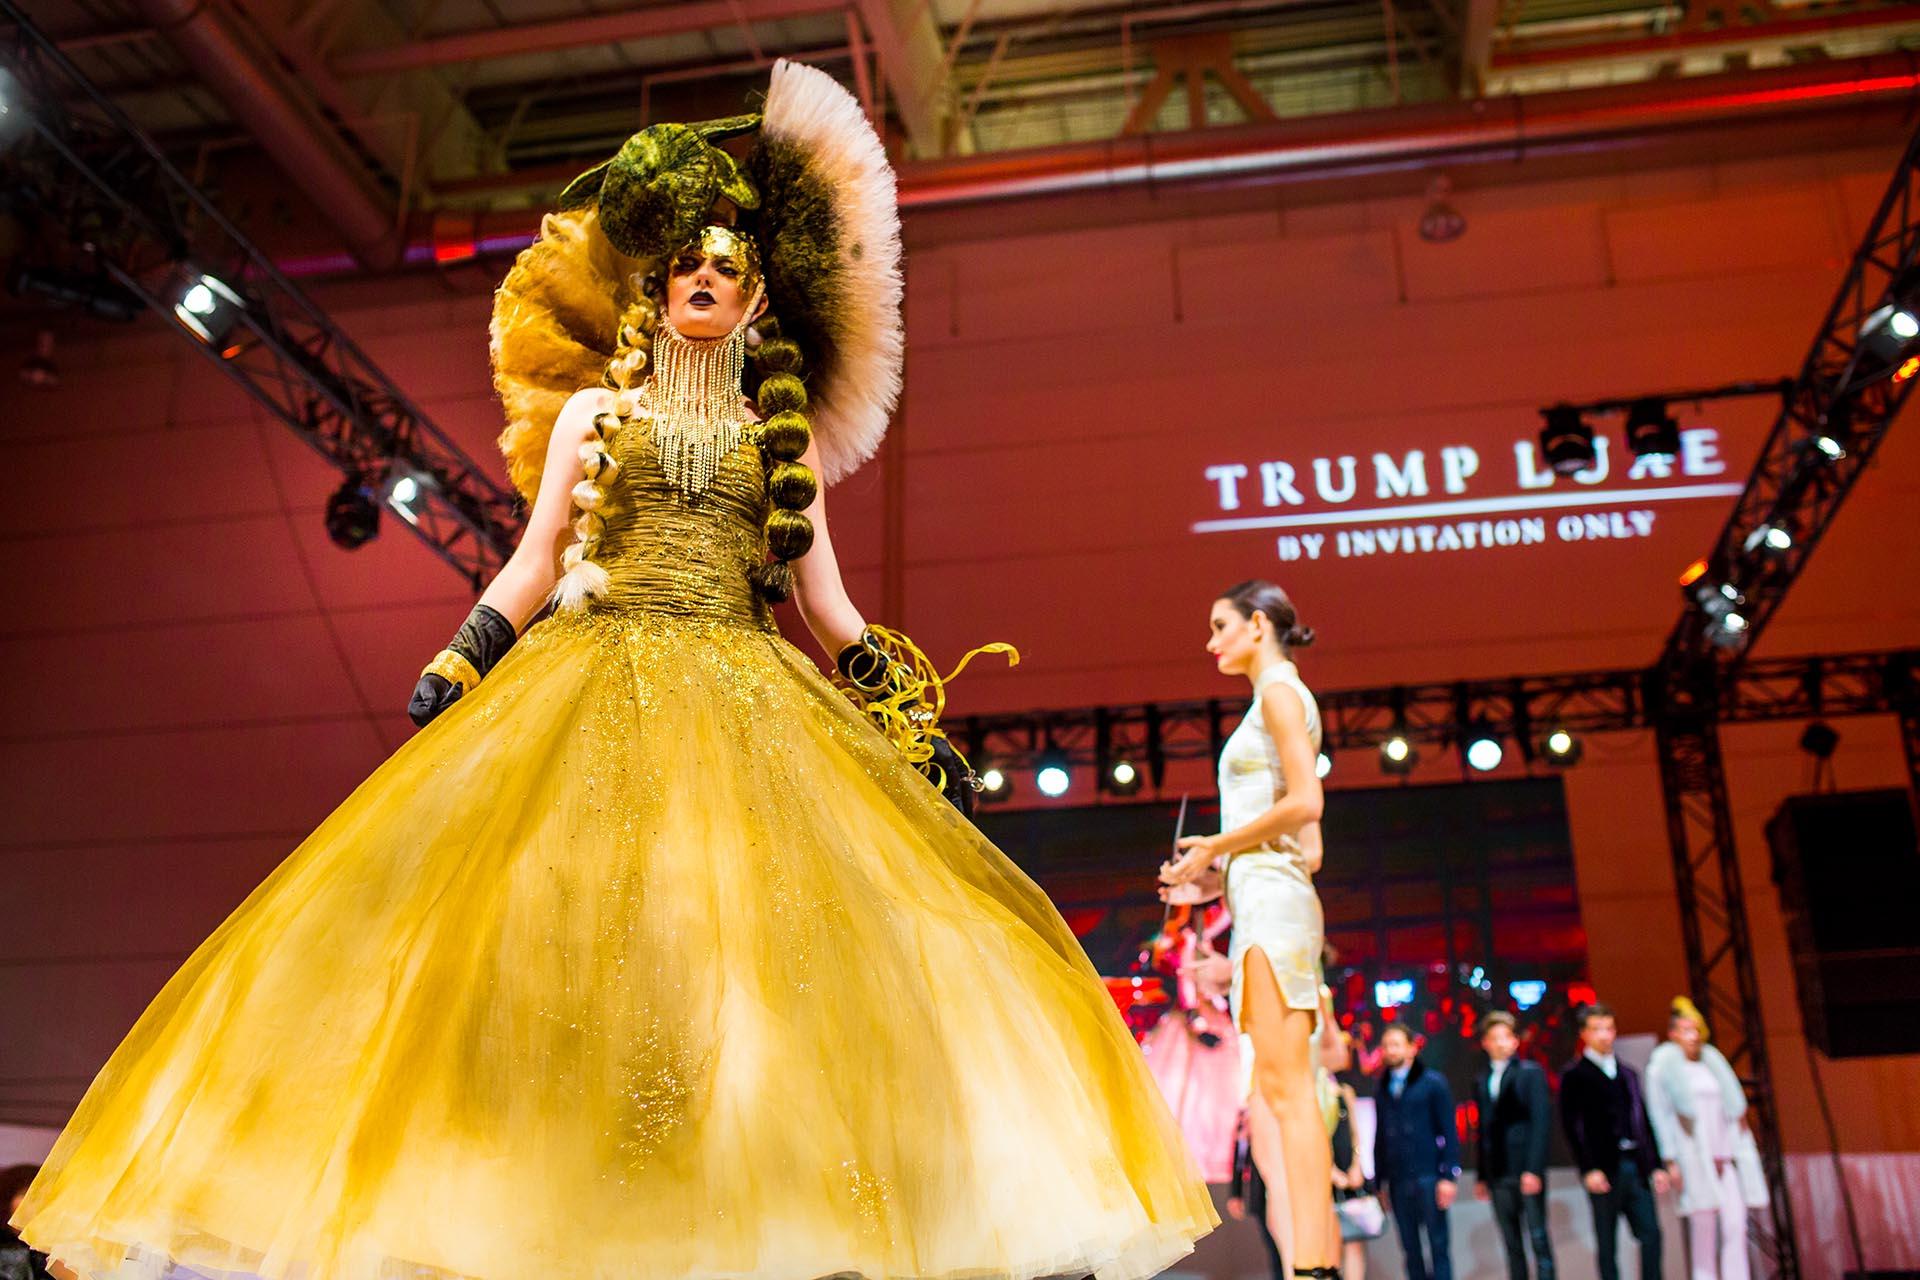 Trump Luxe 01